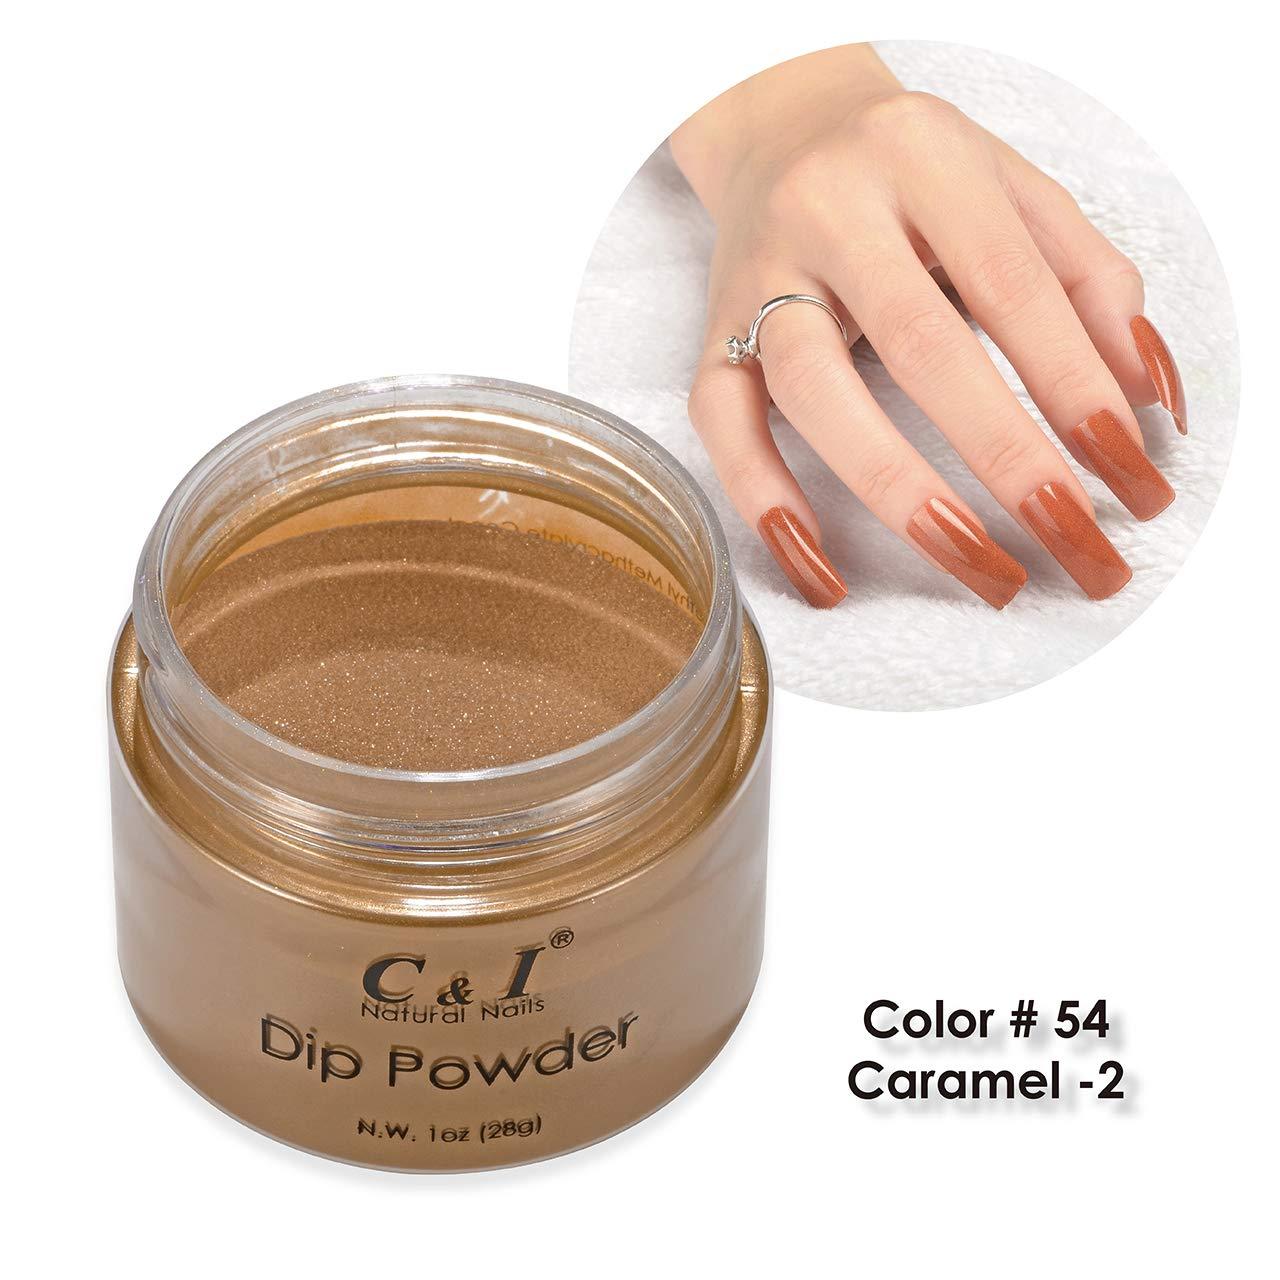 C & I Dip Powder Caramel Color Series (Caramel-2)